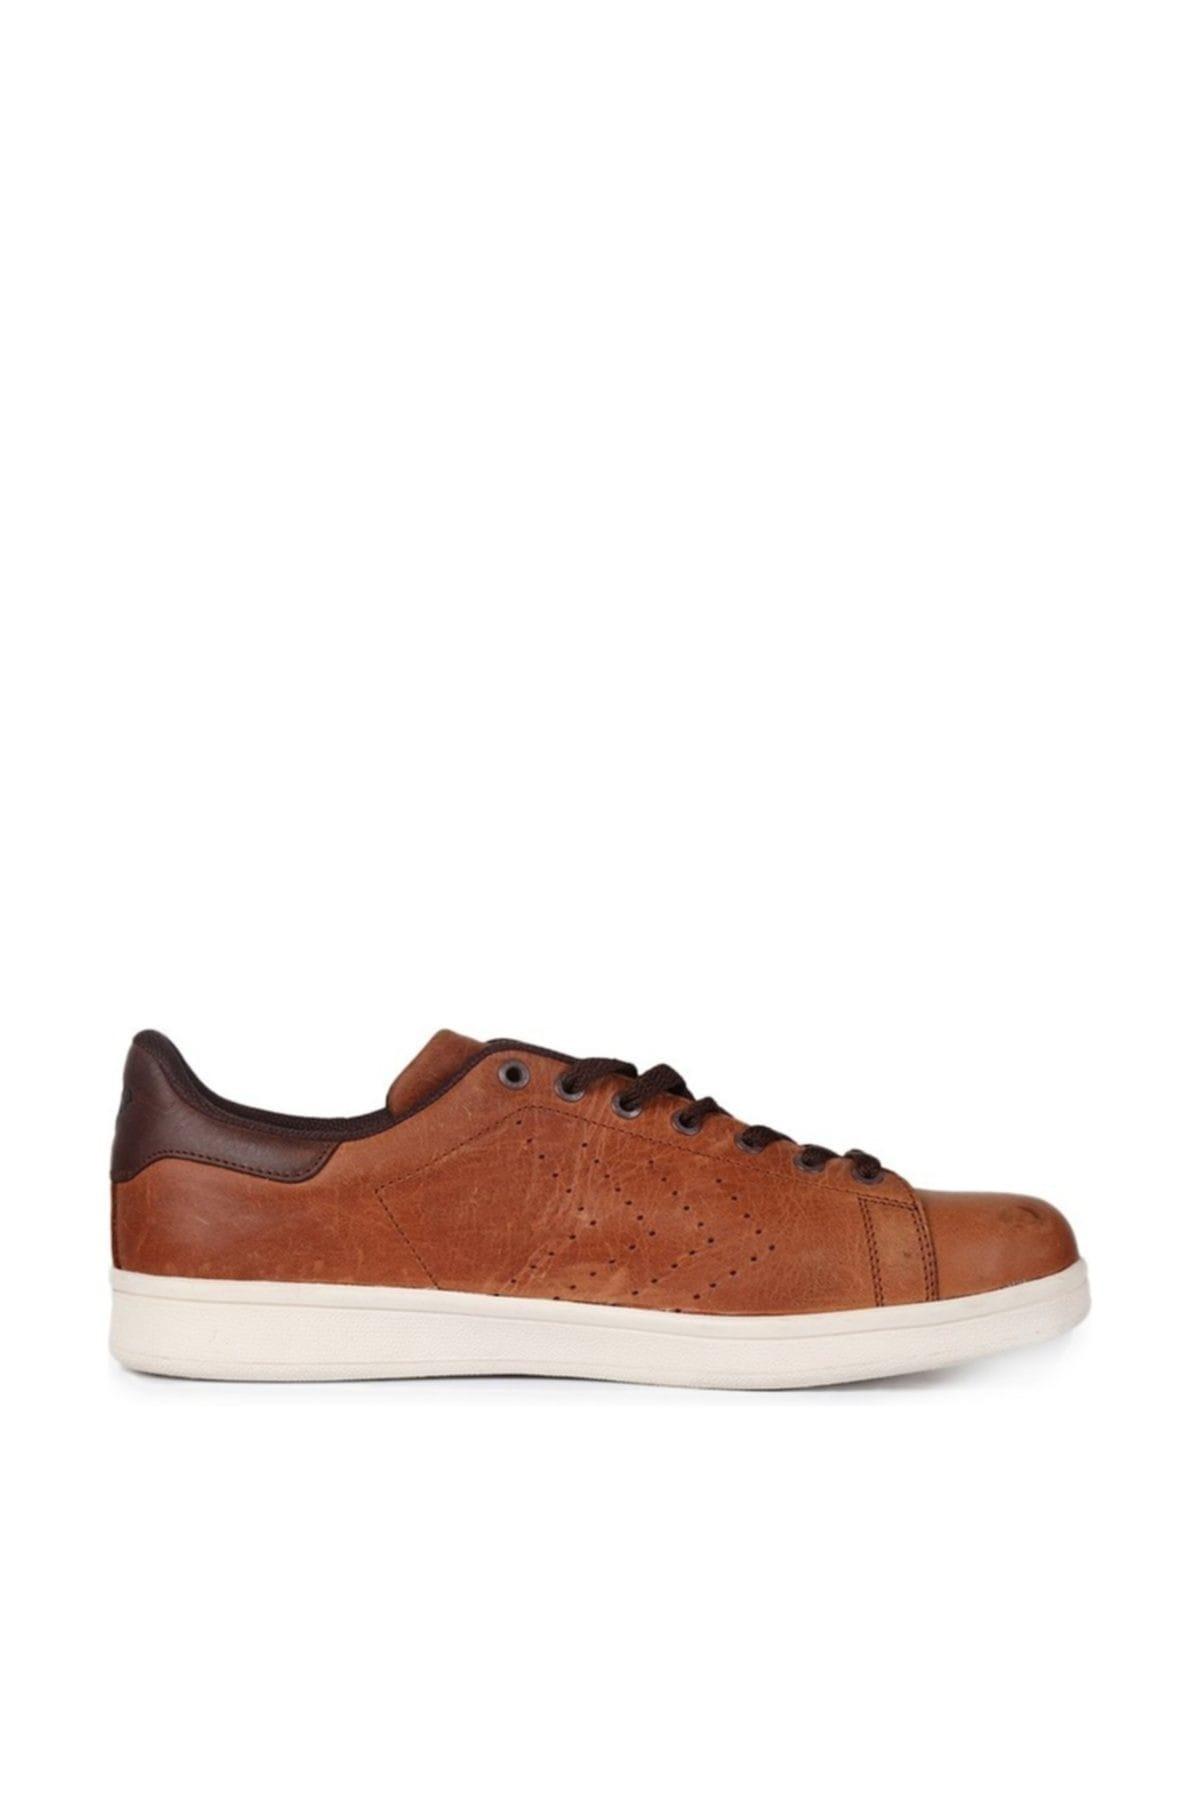 HUMMEL Walter 2 Kahverengi Erkek Deri Sneaker Ayakkabı 100352372 1